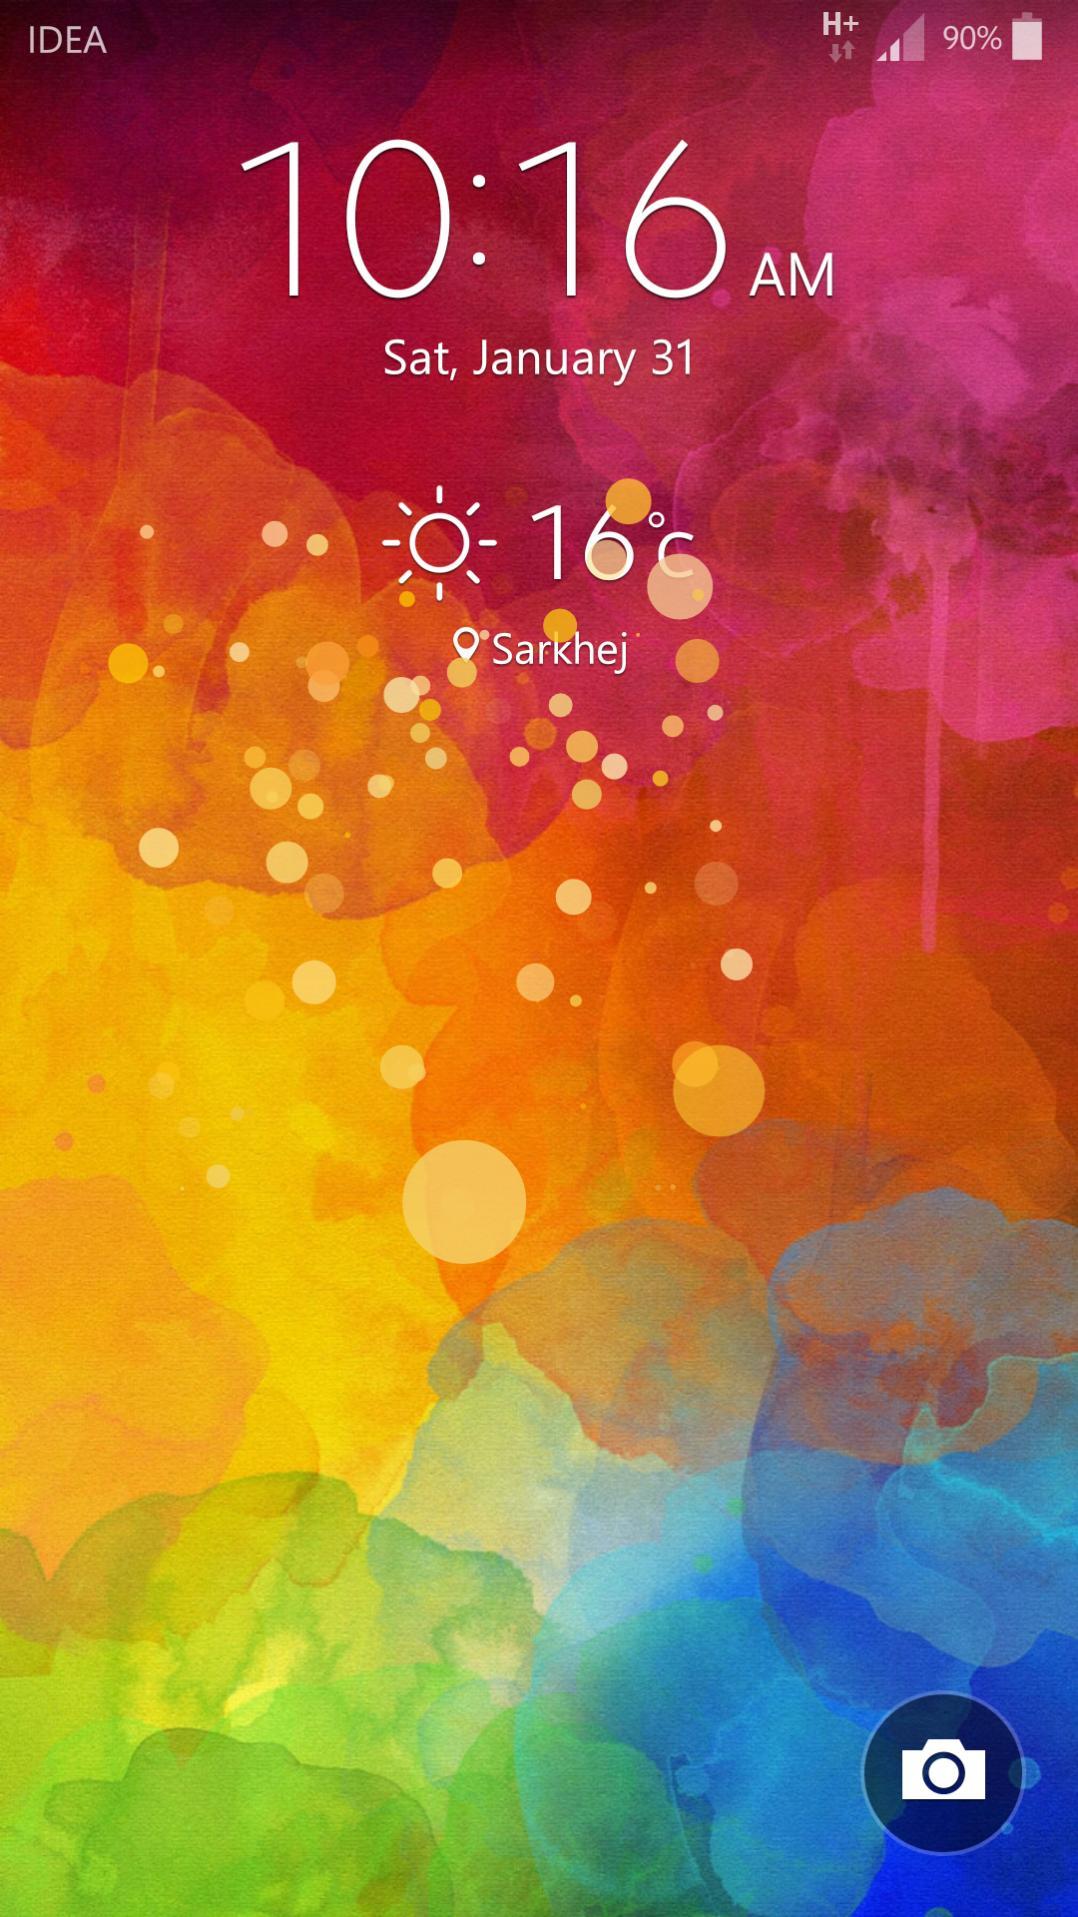 Click image for larger version  Name:Screenshot_2015-01-31-10-16-26.jpg Views:14682 Size:236.3 KB ID:3142836